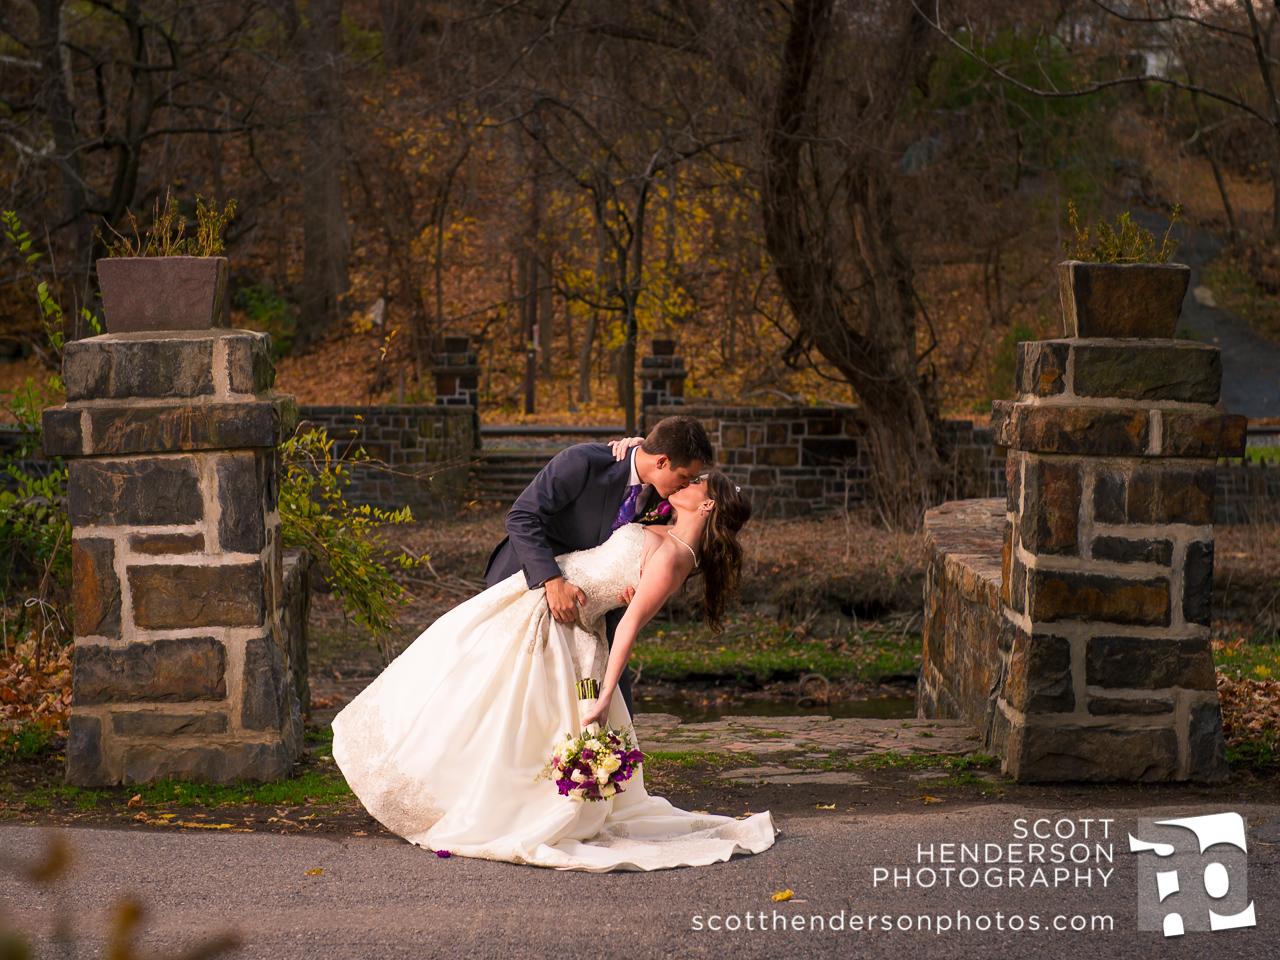 yearinreview-wedding-019.jpg